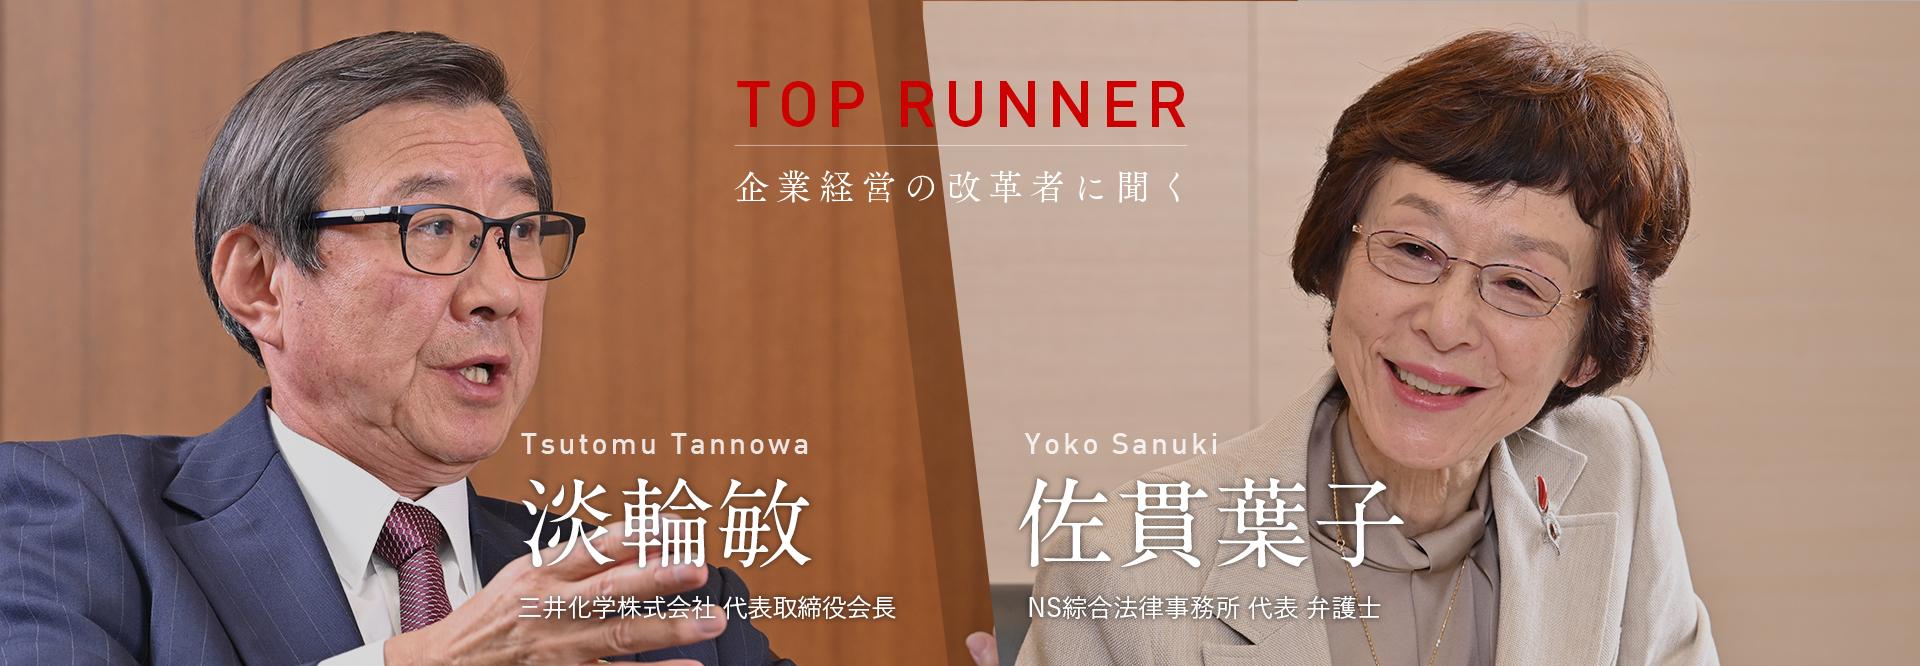 TOP RUNNER:企業経営の改革者に聞く vol.6 淡輪敏×佐貫葉子